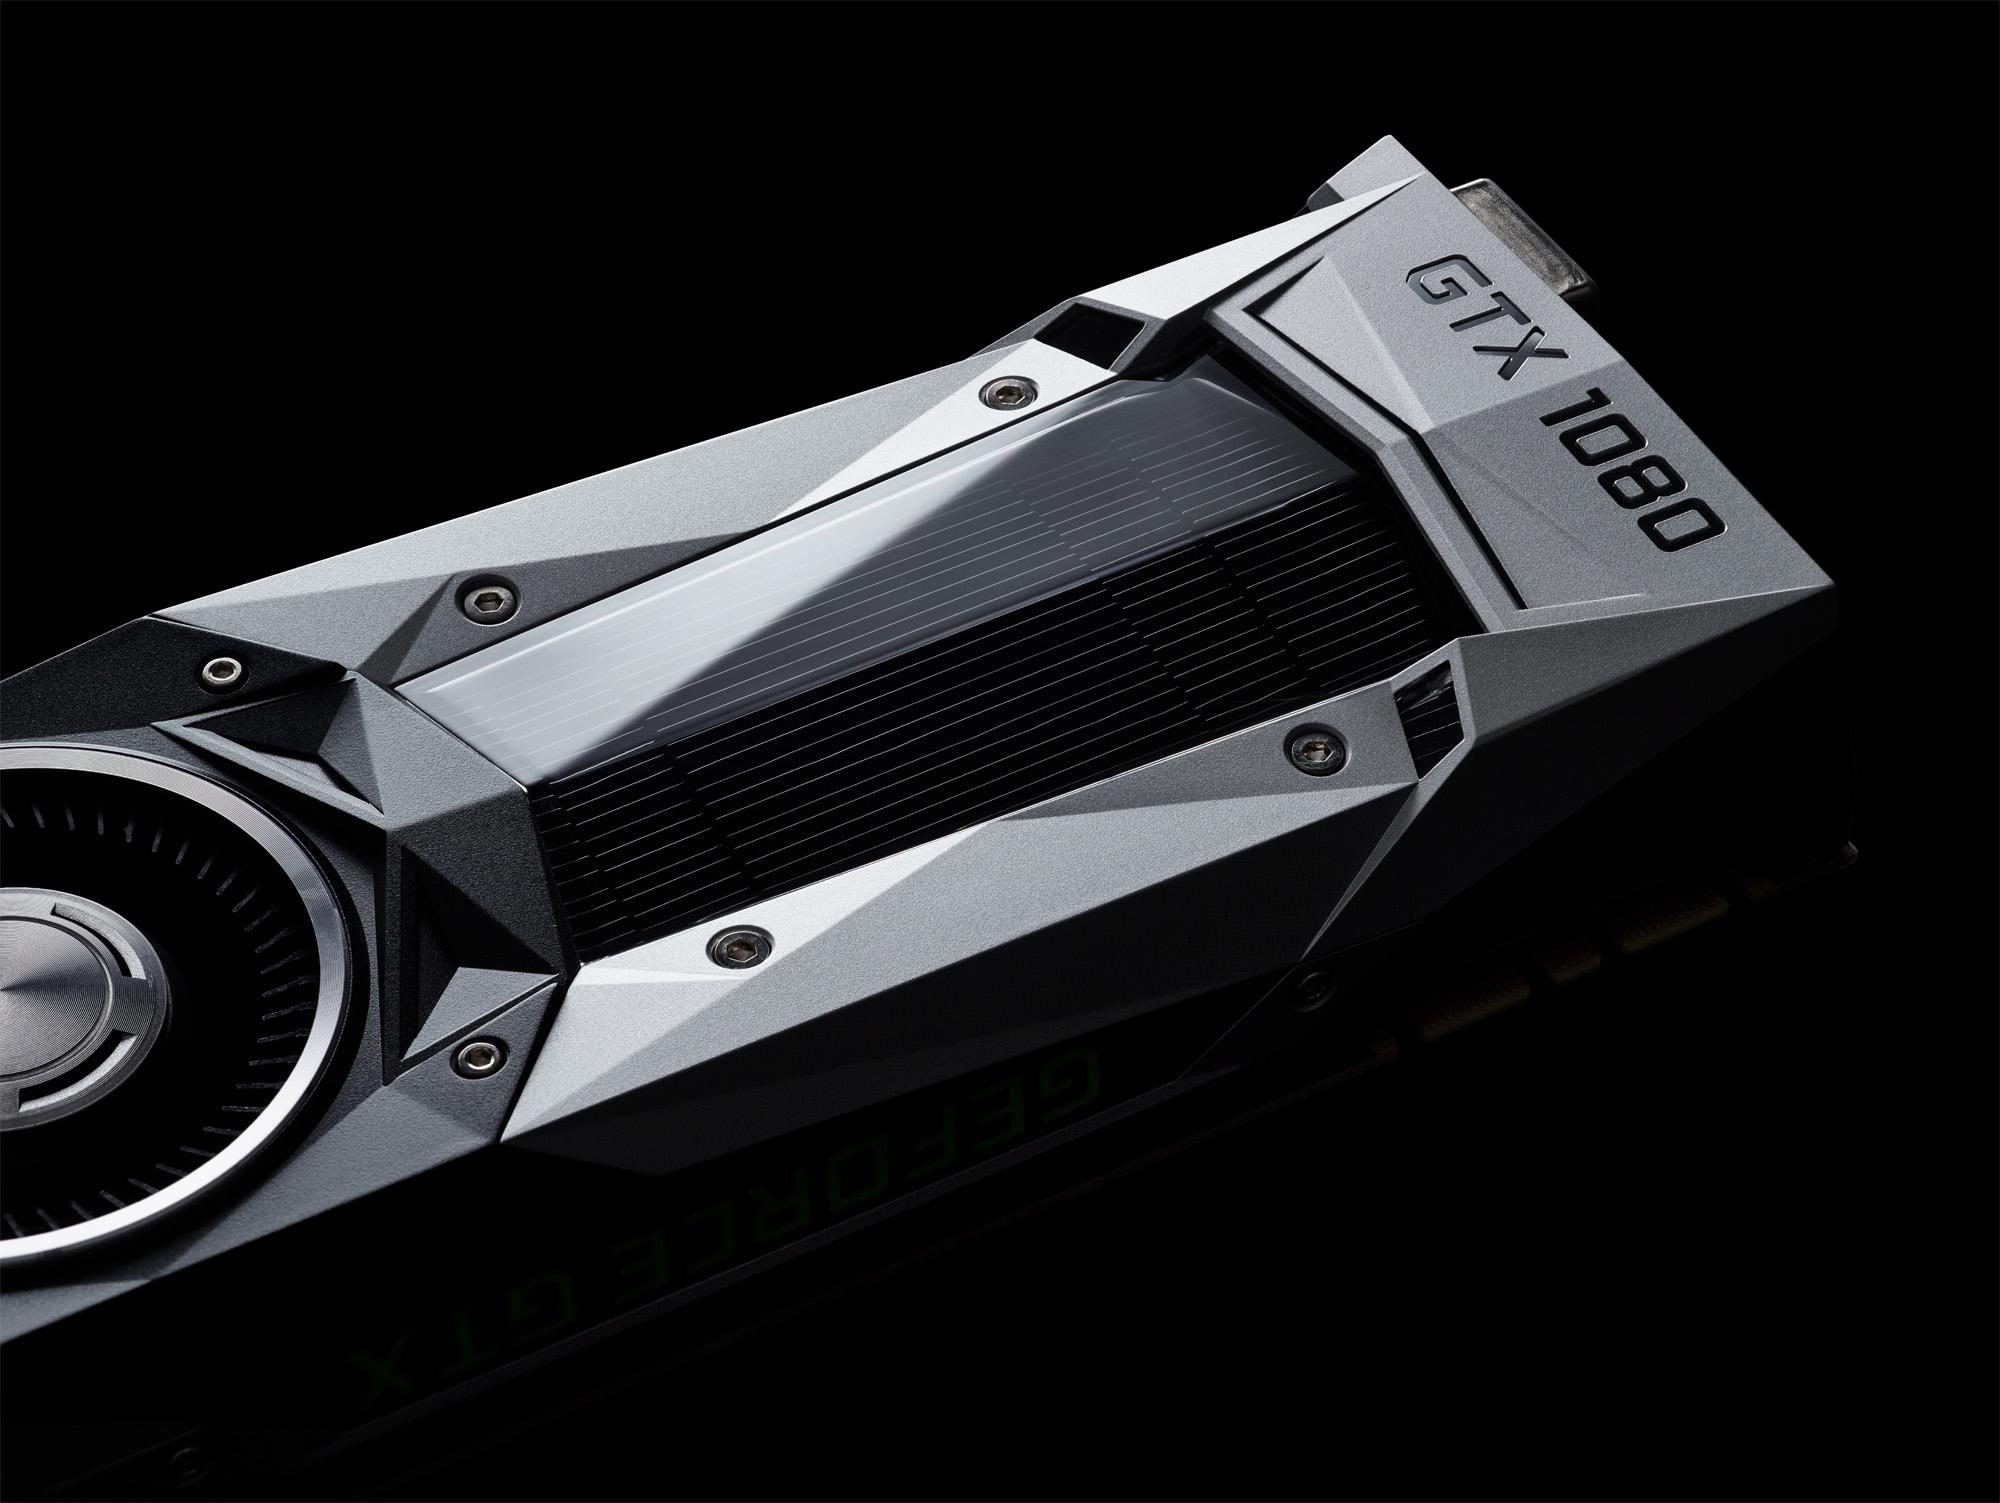 GeForce GTX 1080 is a beautiful powerhouse, but you still